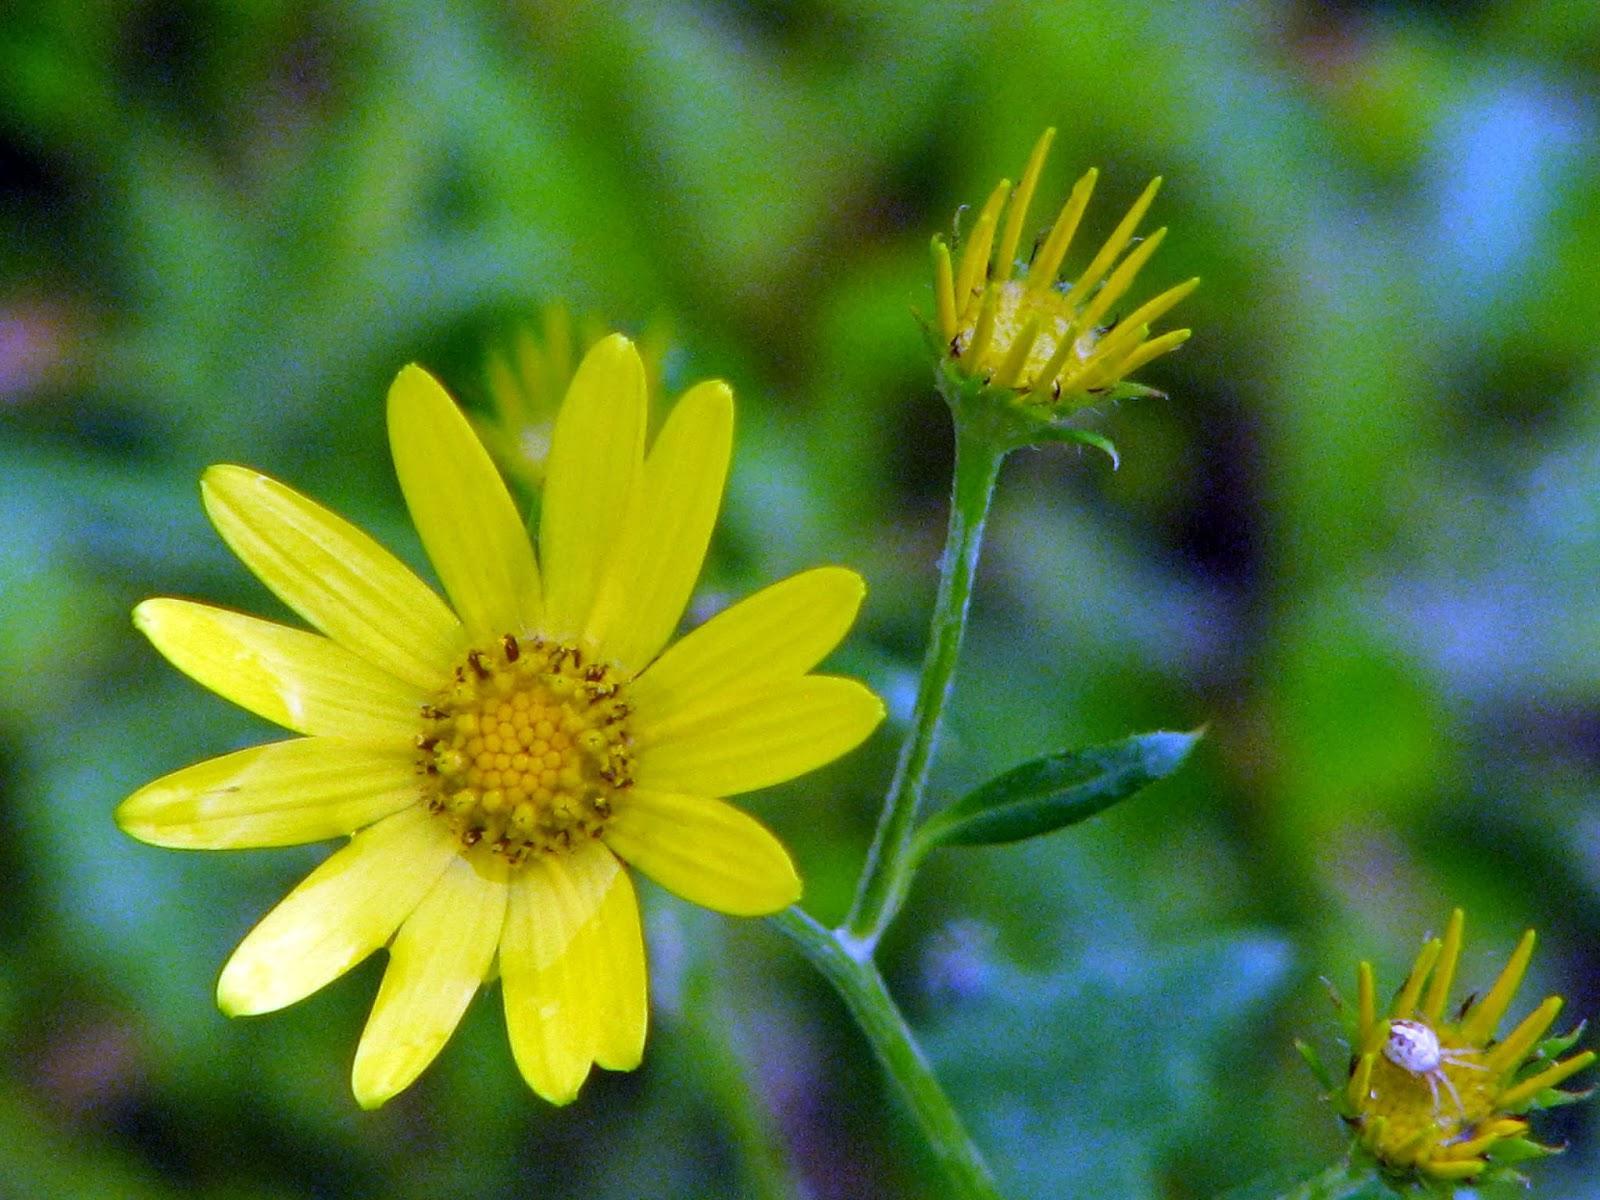 My Travel Adventures Ratangad Sonki Flower Special Trek To Jewel Fort